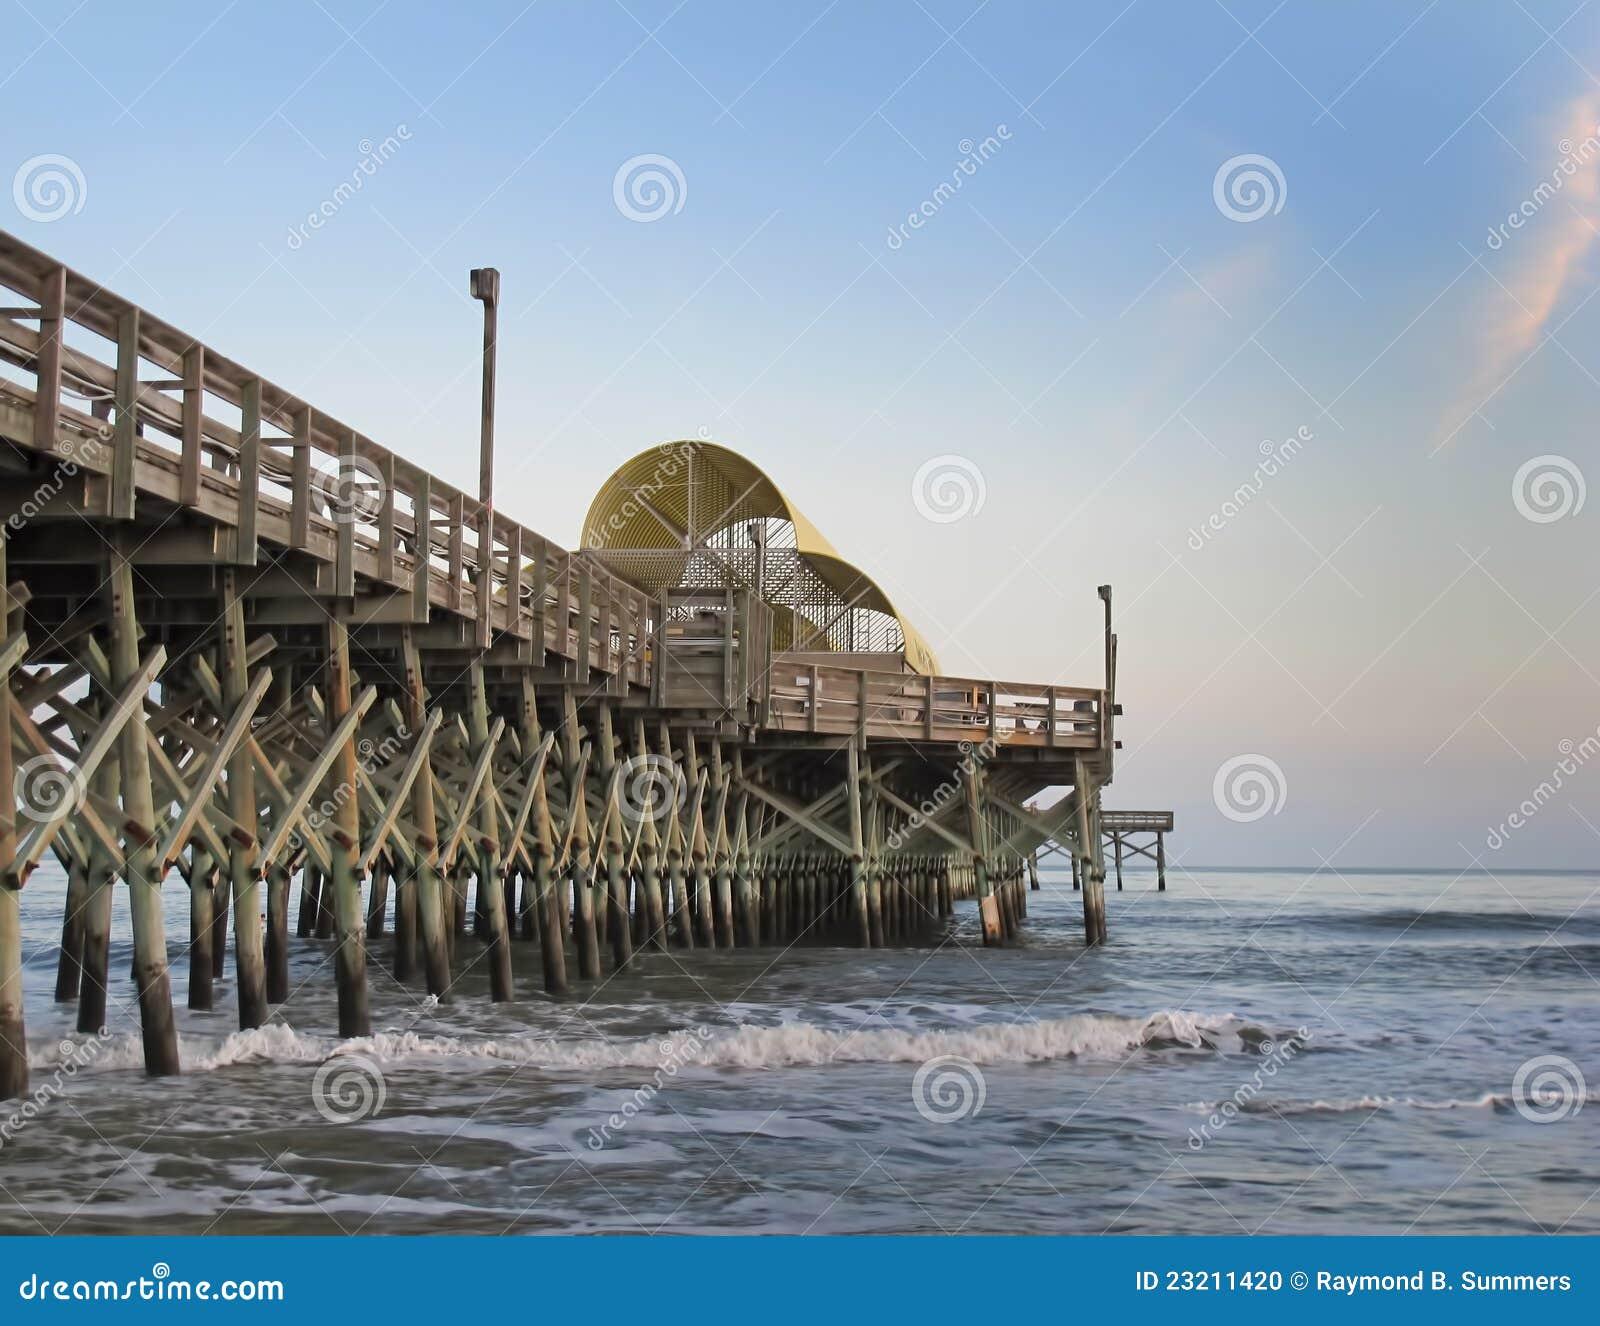 Apache-Pier, Myrtle Beach, South Carolina